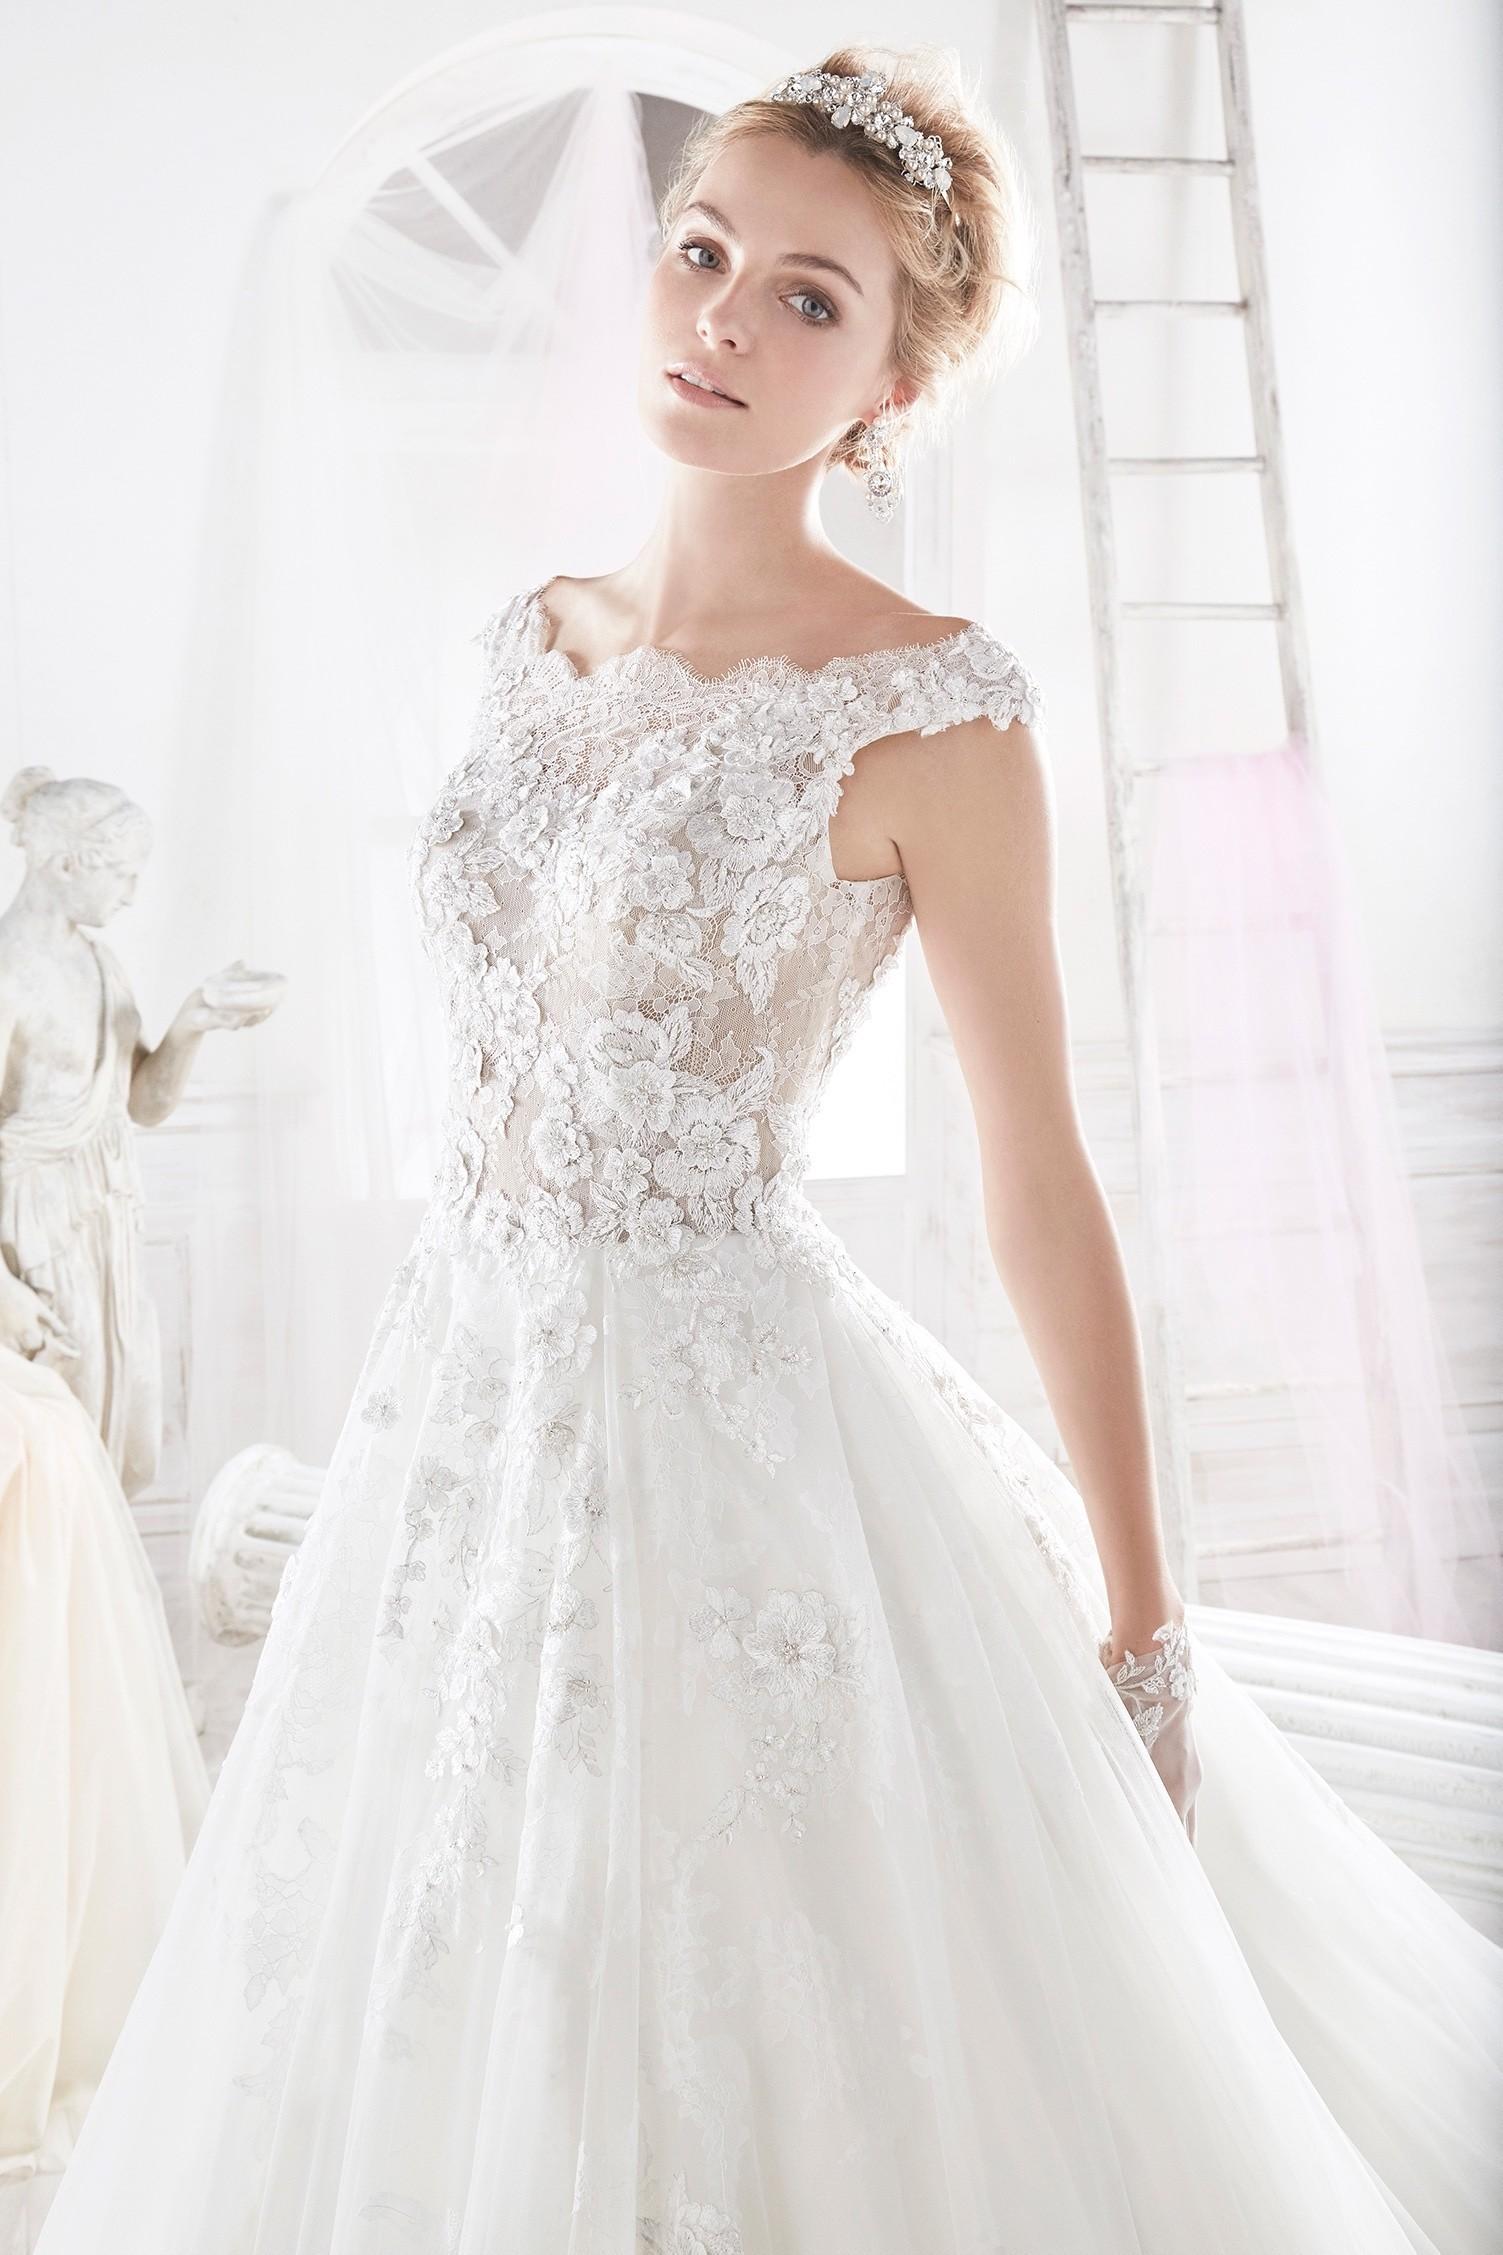 nicole-spose-NIAB18035-Nicole-moda-sposa-2018-72